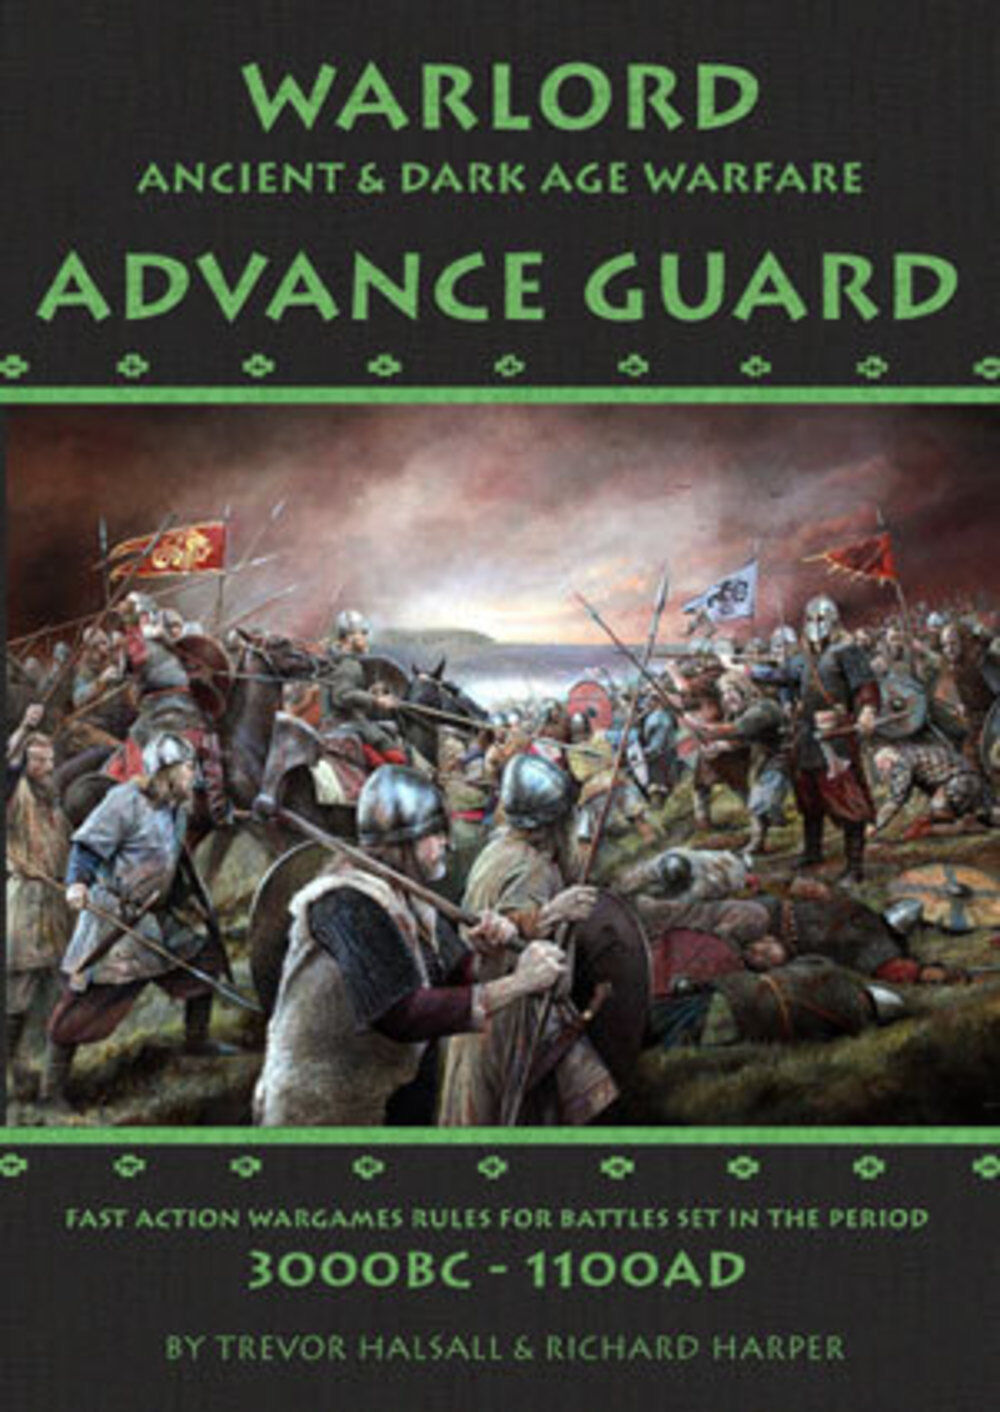 WARLORD WARLORD WARLORD ADVANCE GUARD - ANCIENT & DARK AGE WARFARE